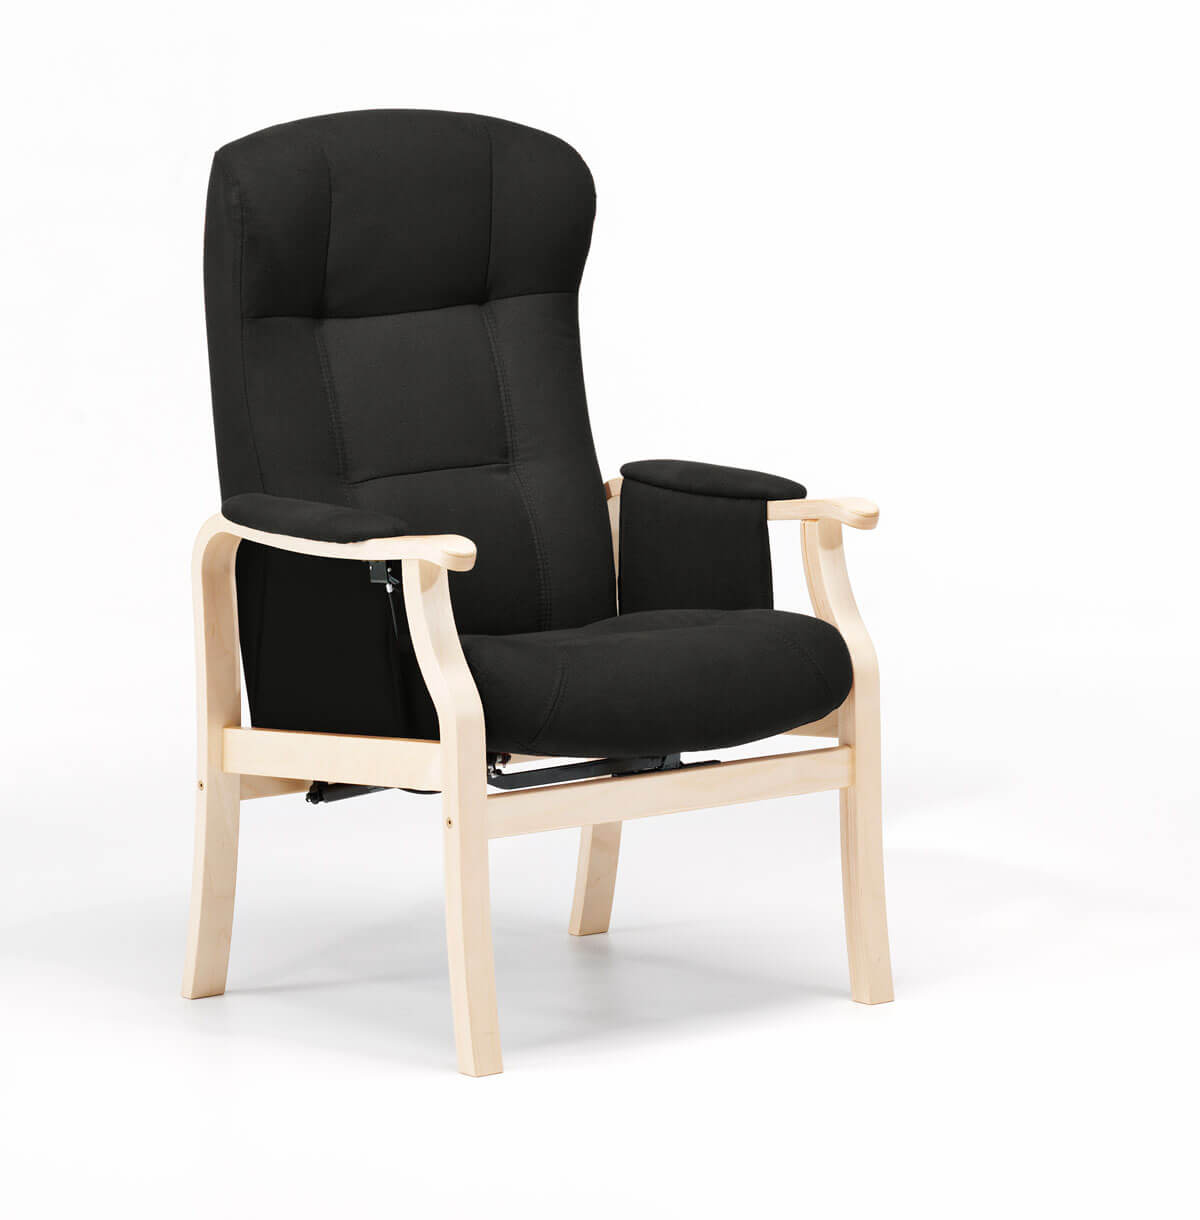 Nordic-c sorø standard seniorstol - antracitgrå stof og træ, m. armlæn, eksl. skammel